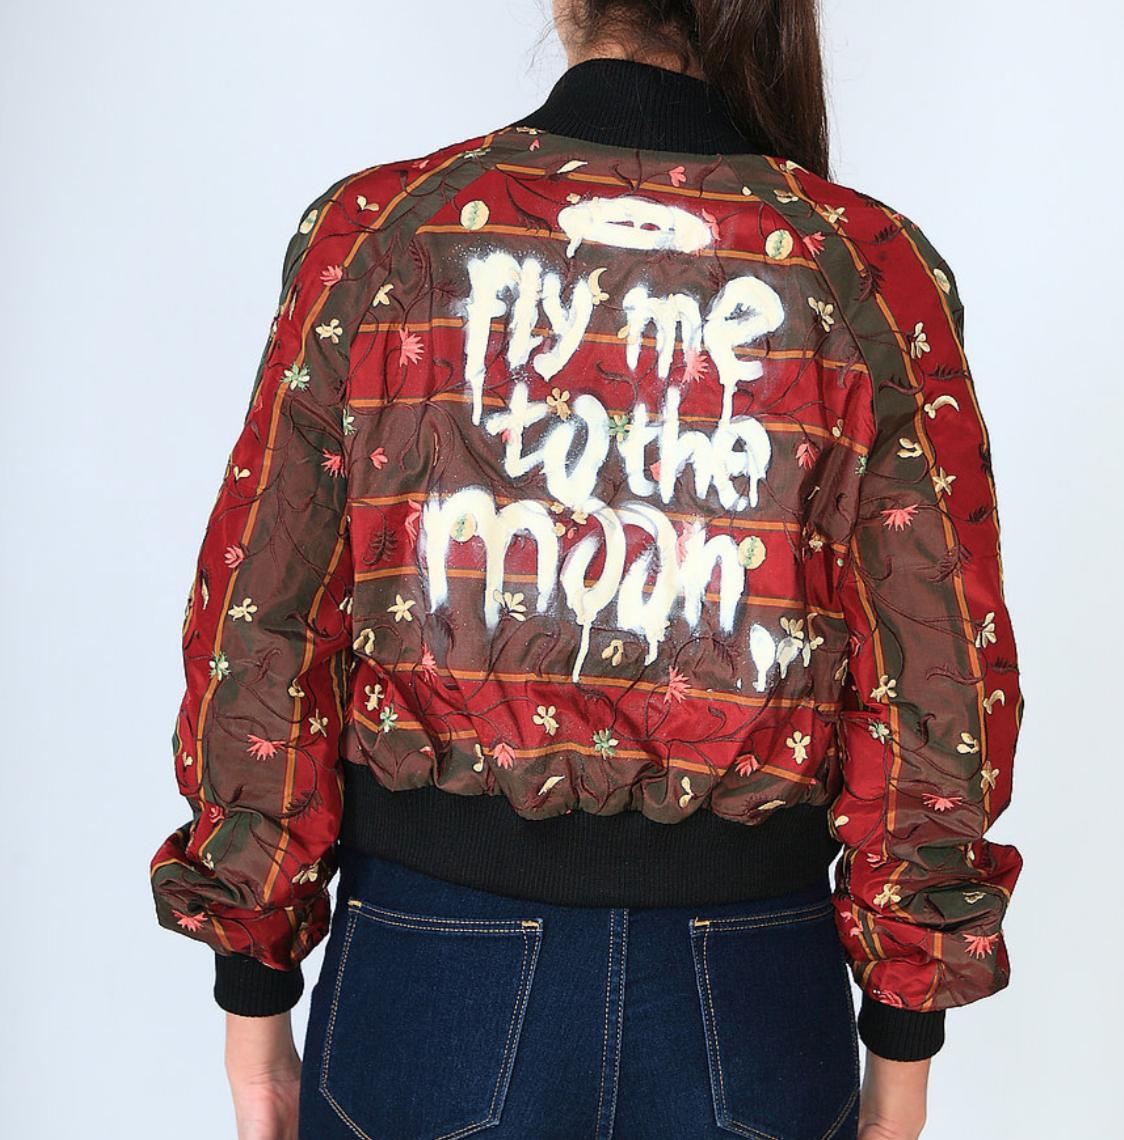 O'RAS graffiti jacket